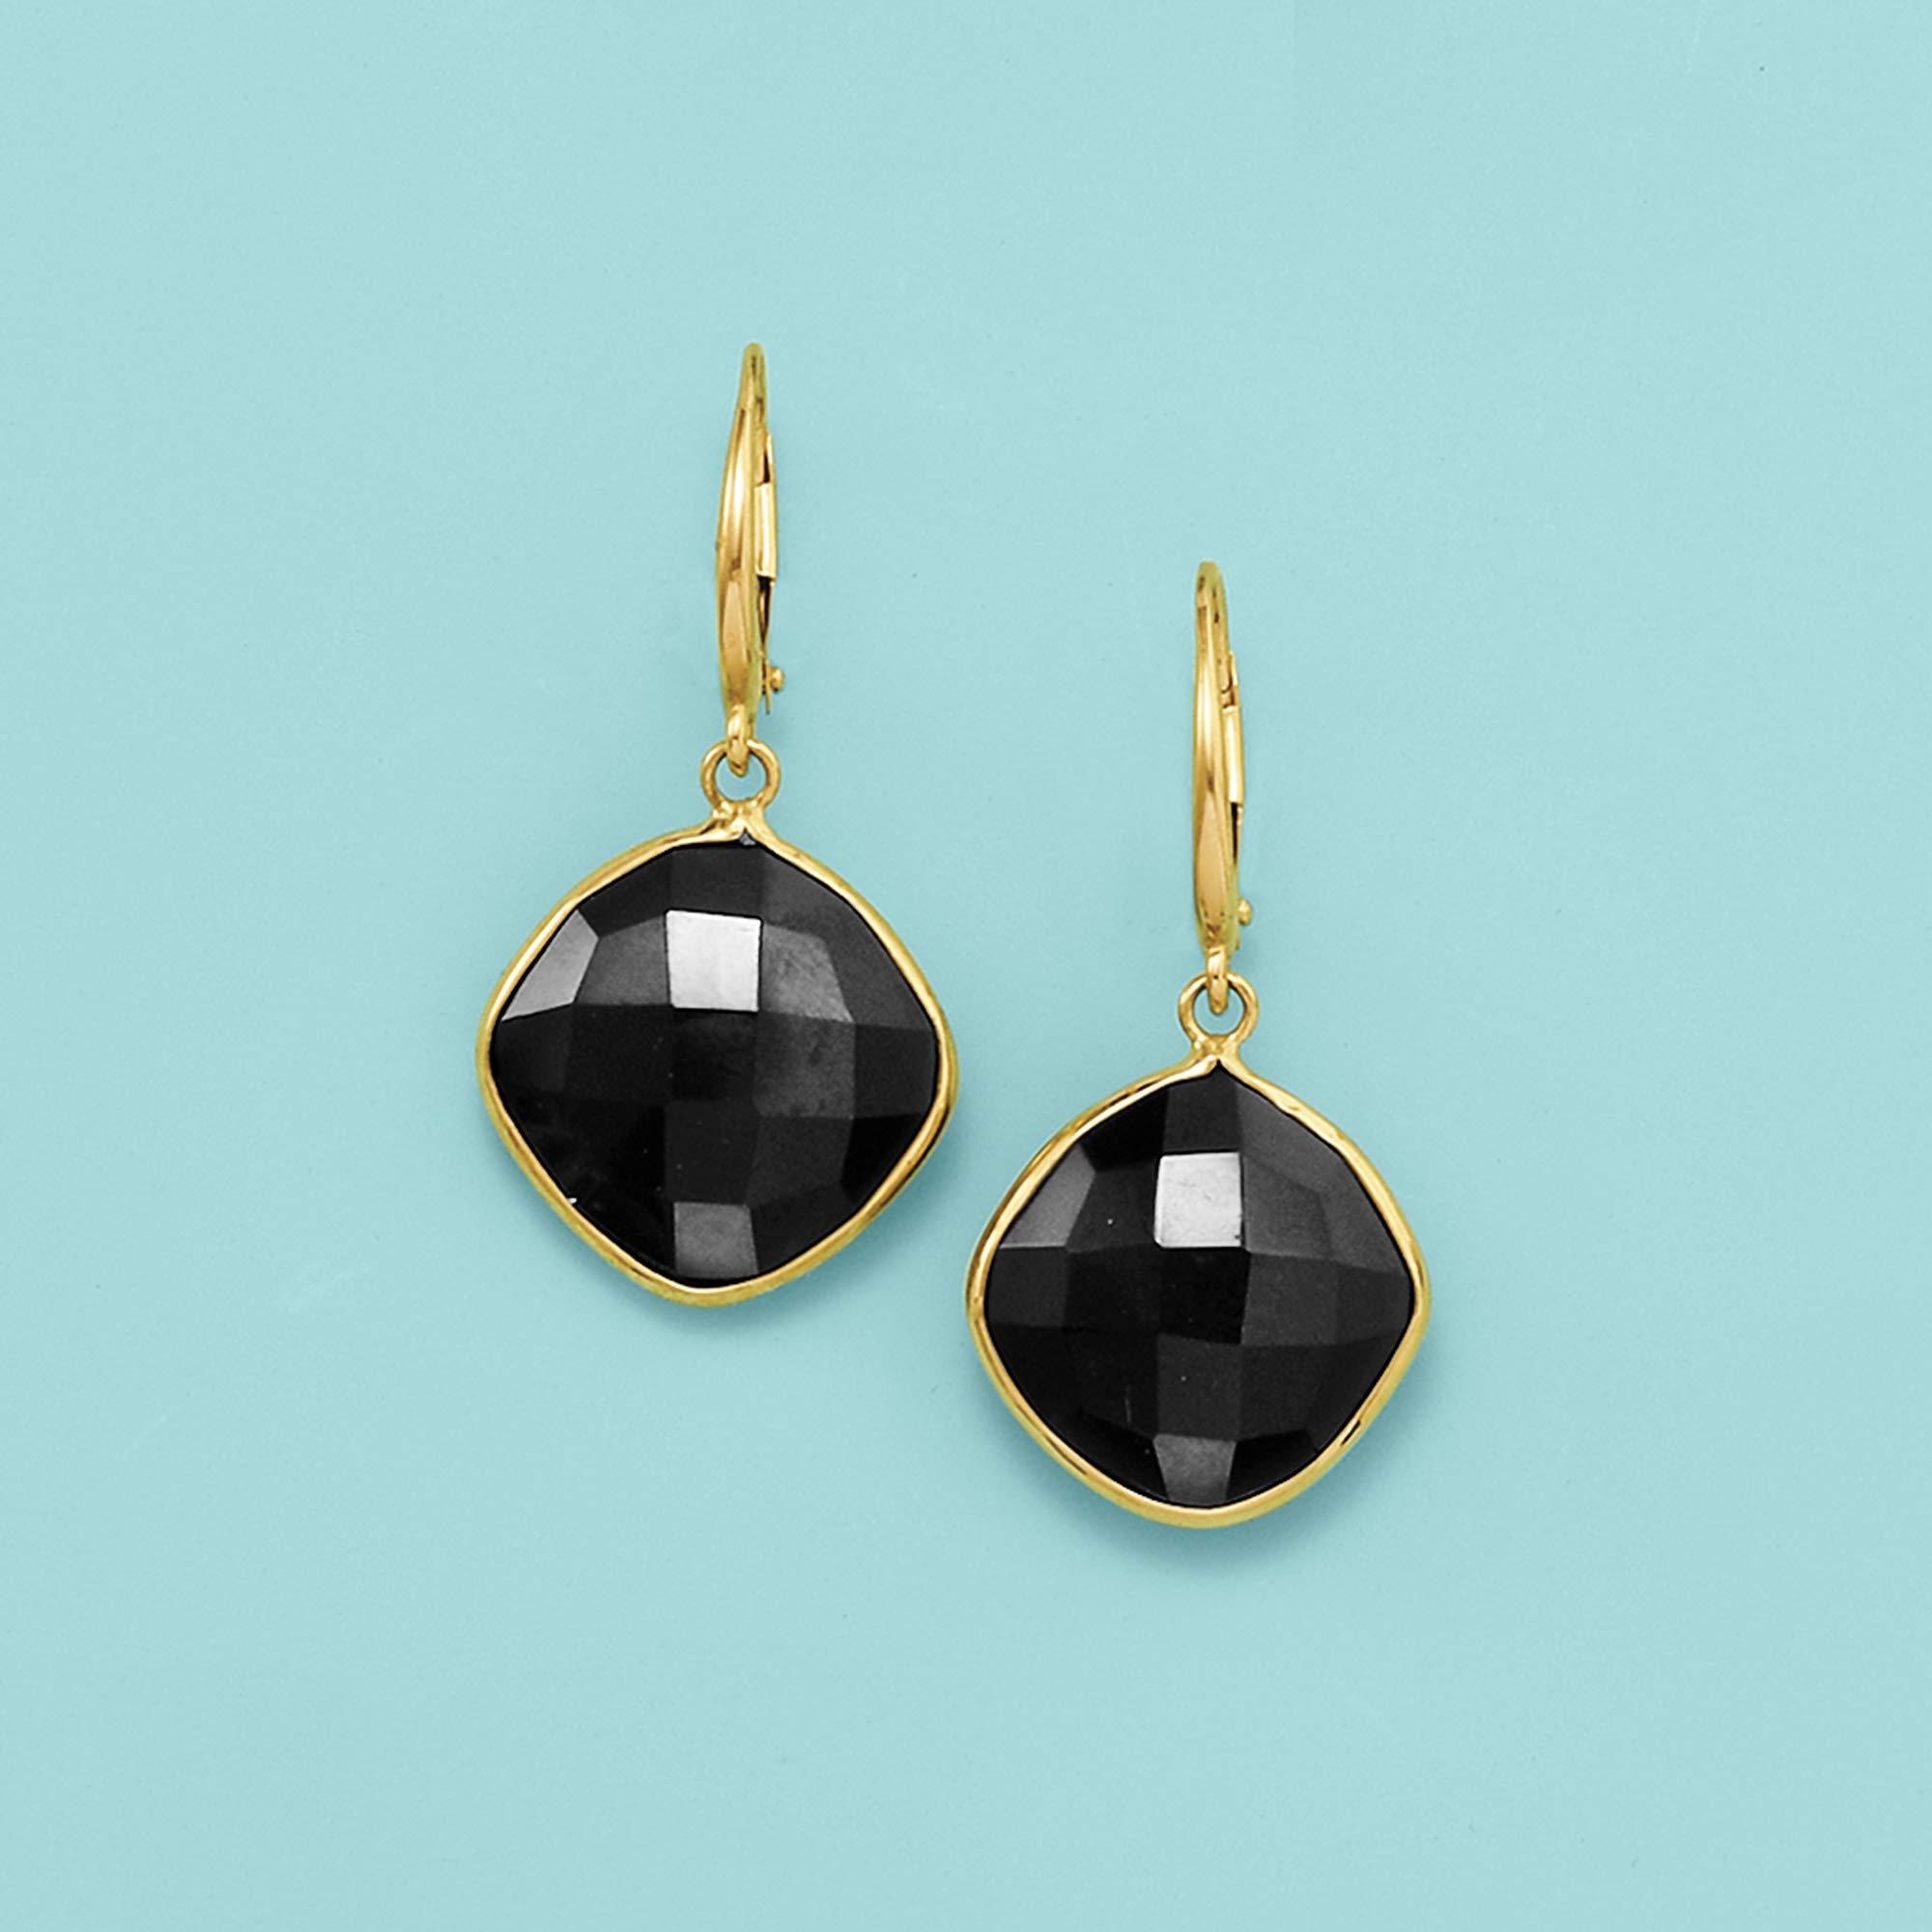 Ross-Simons 14mm Black Onyx Drop Earrings in 14kt Yellow Gold by Ross-Simons (Image #3)